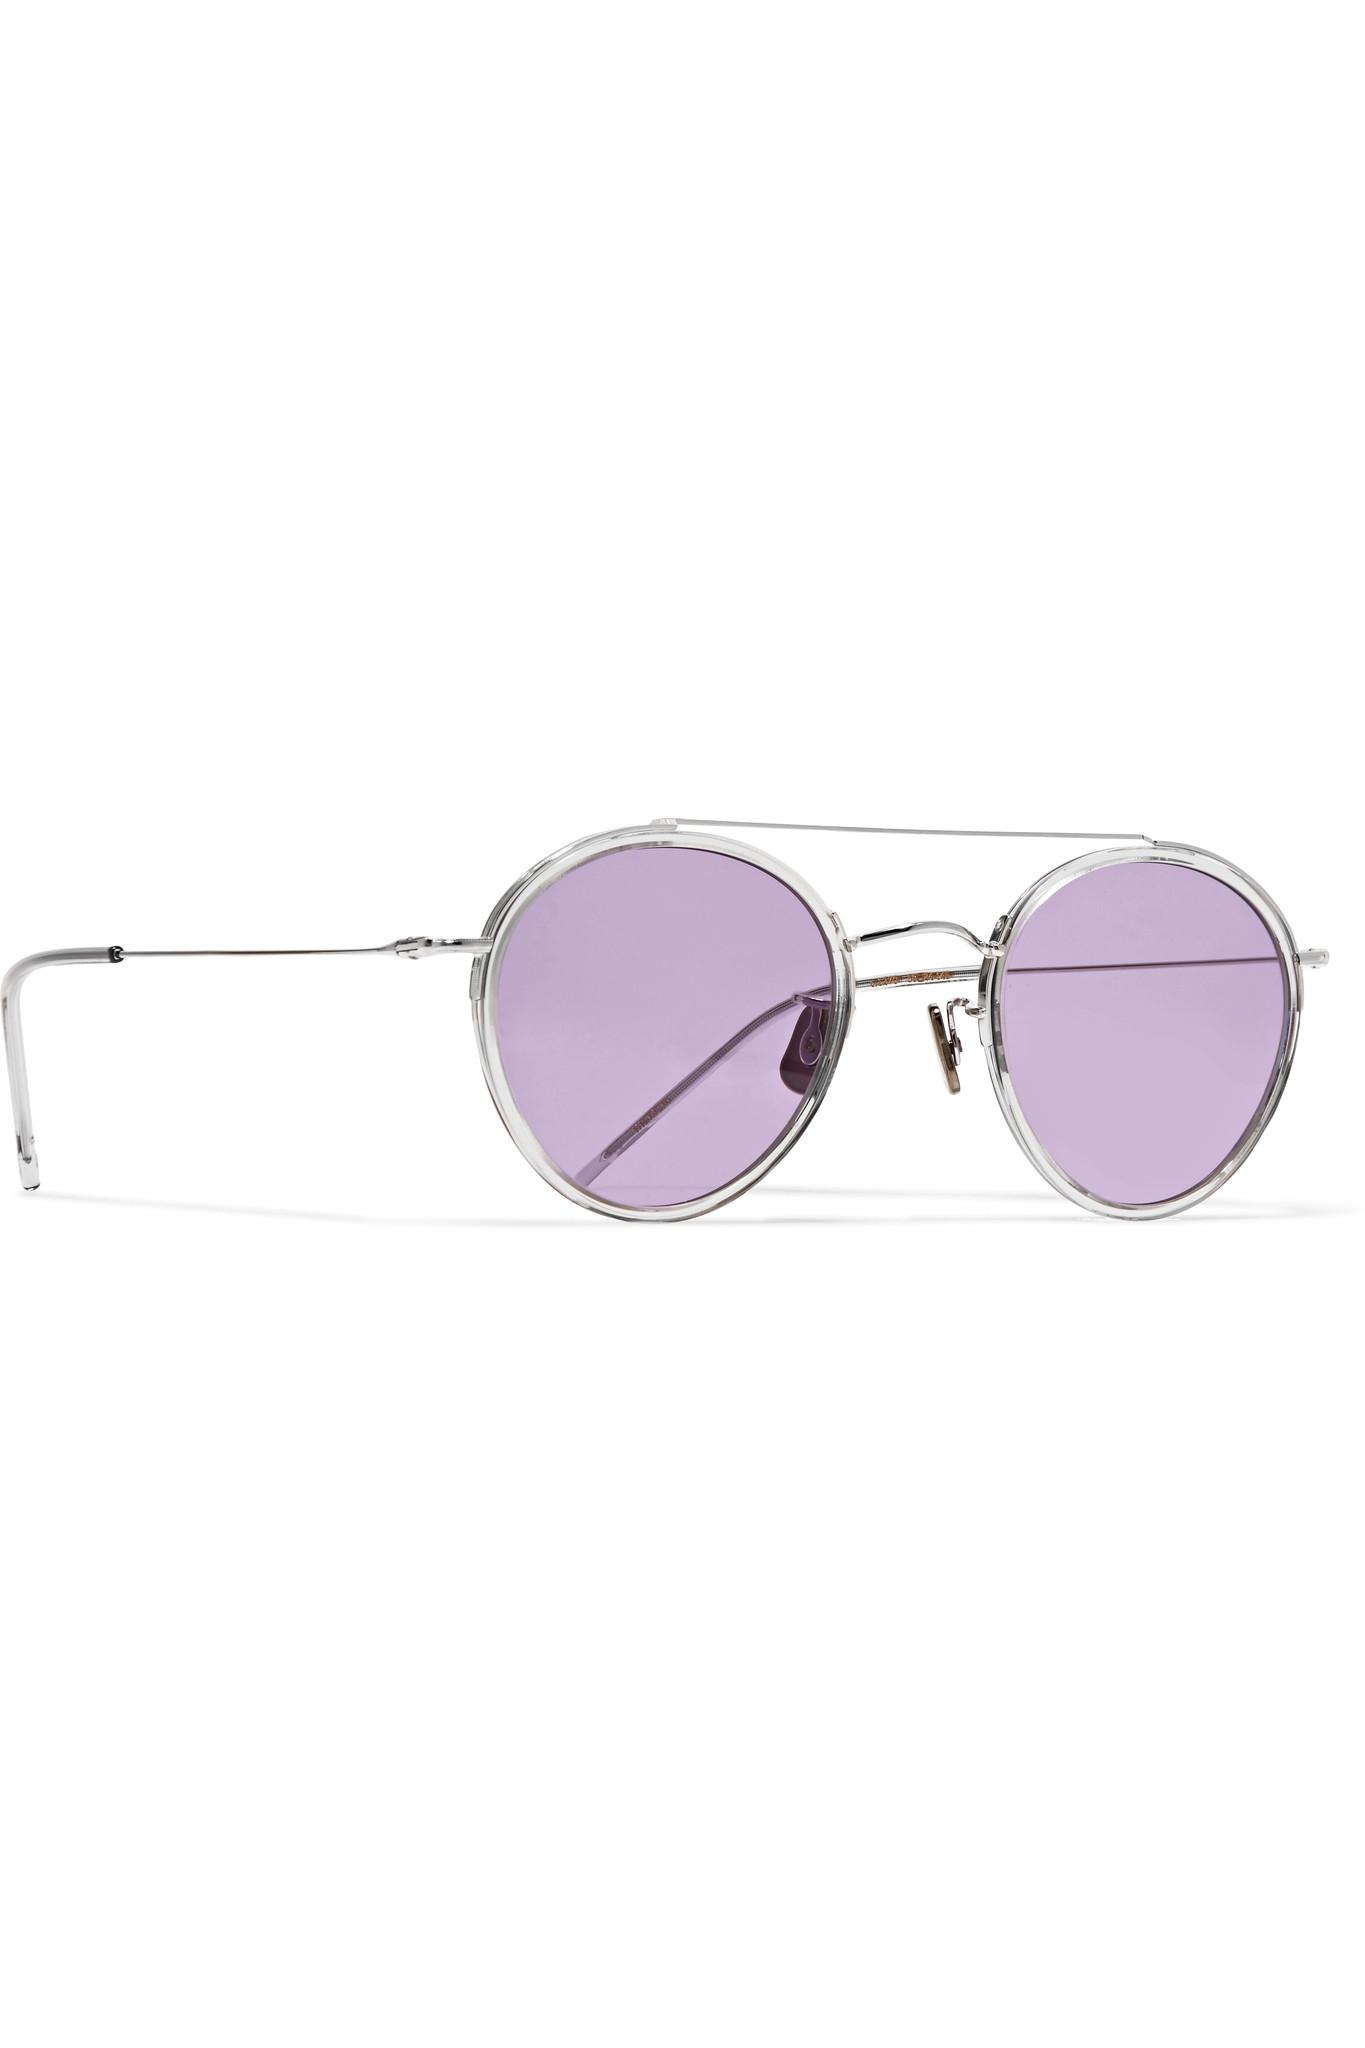 9646333d18 Lyst - Eyevan 7285 Round-frame Silver-tone Sunglasses in Metallic